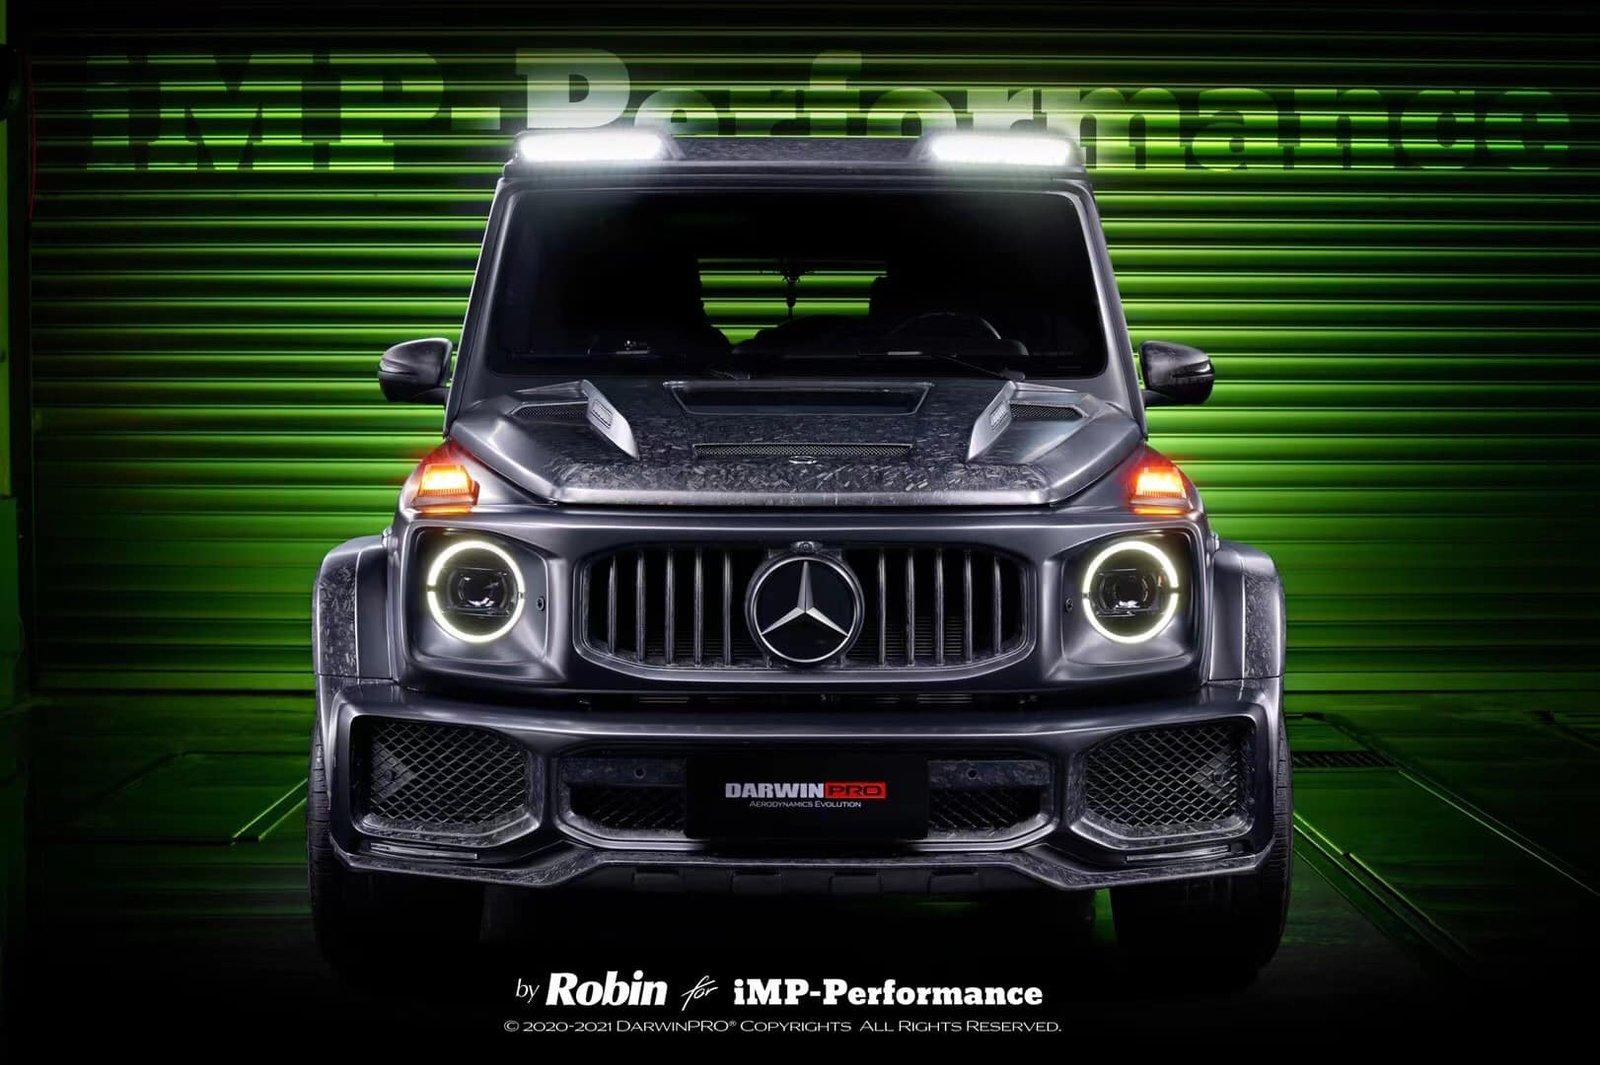 2021 Mercedes-AMG G63 Body Kit DarwinPro IMP